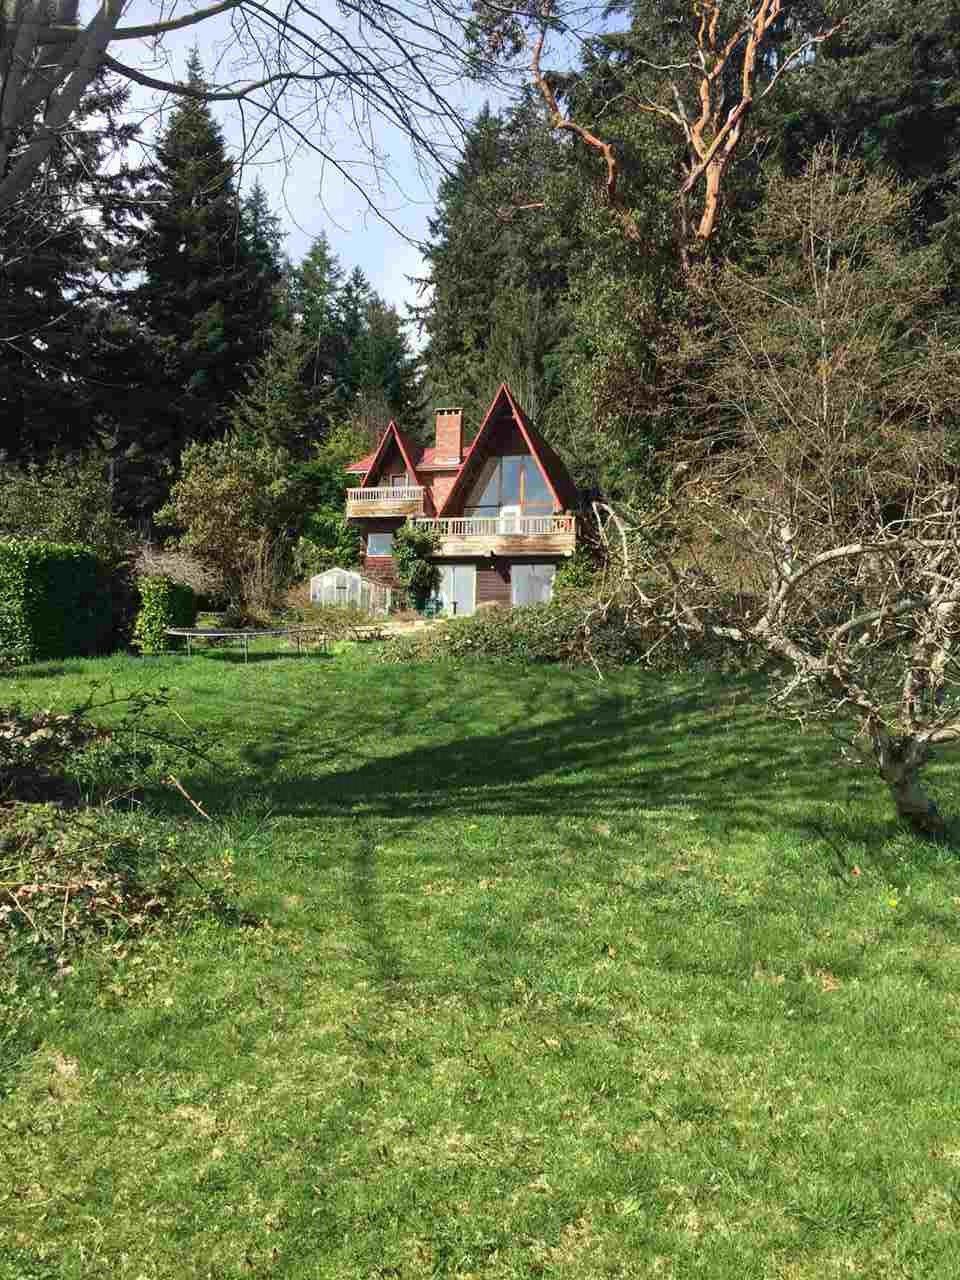 Photo 5: Photos: 2477 MILLINER Road: Roberts Creek House for sale (Sunshine Coast)  : MLS®# R2155266